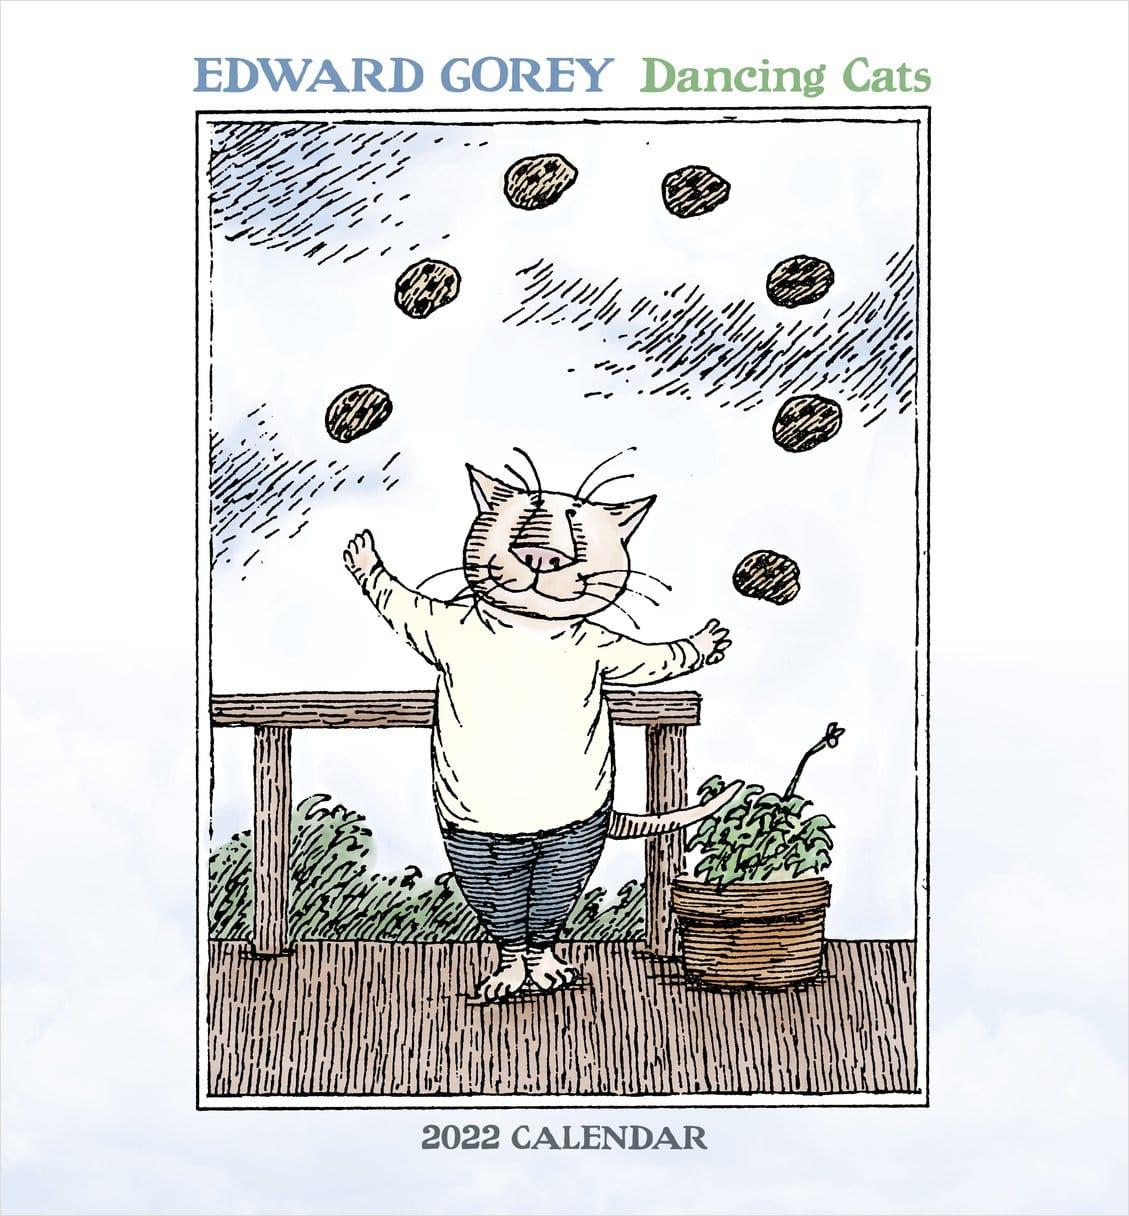 Gorey Dancing Cats 2022 Calendar